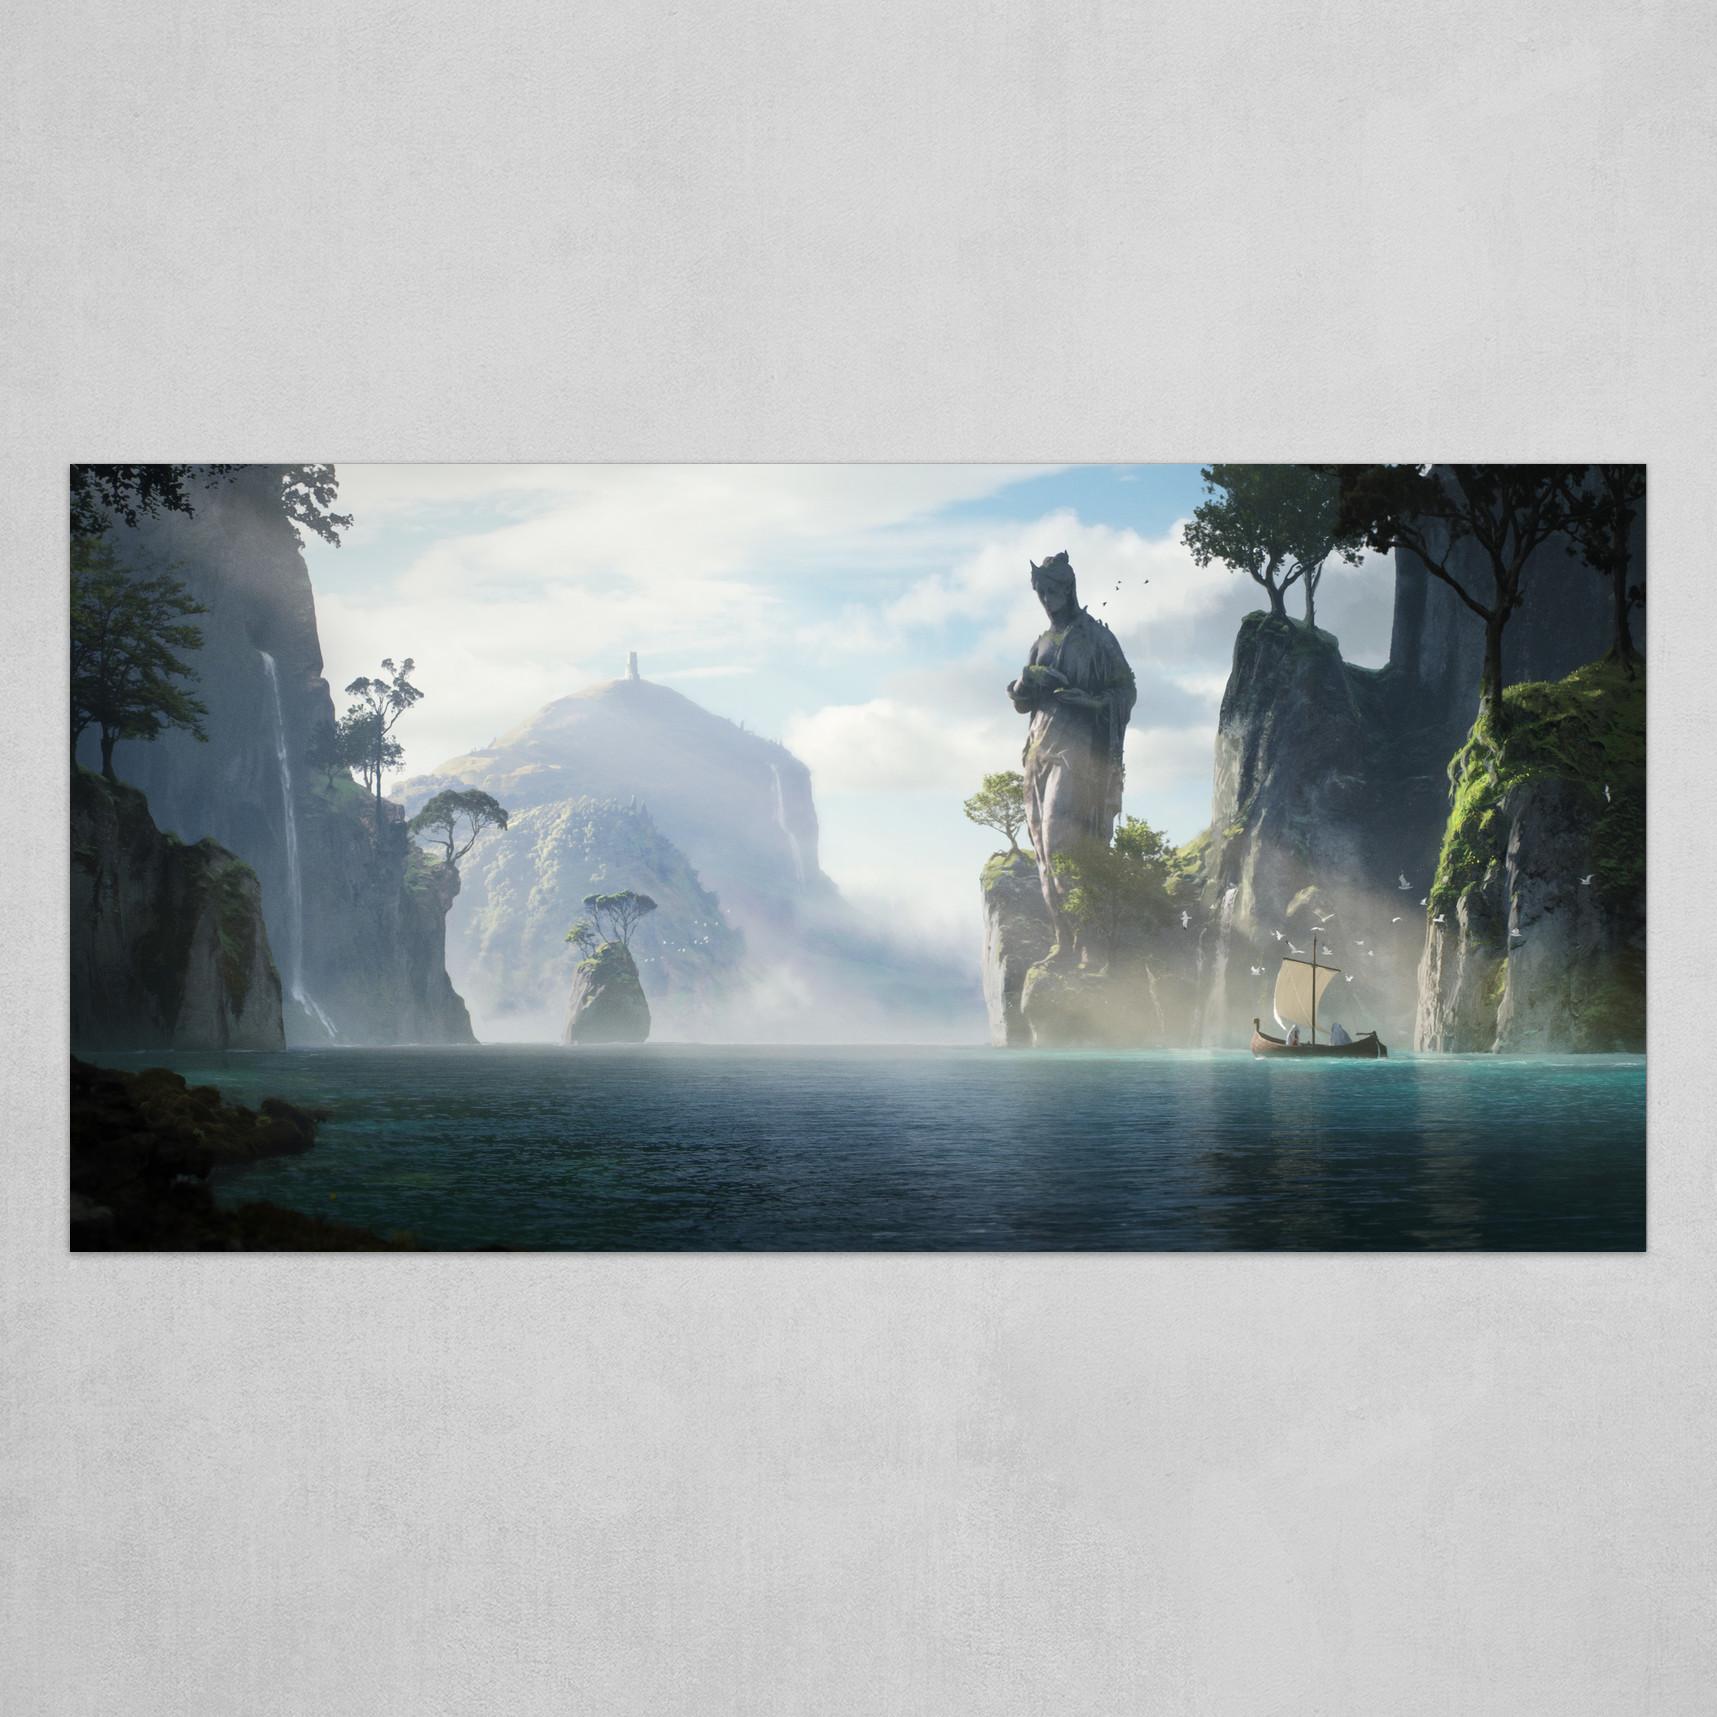 Avalon - Artstation challenge